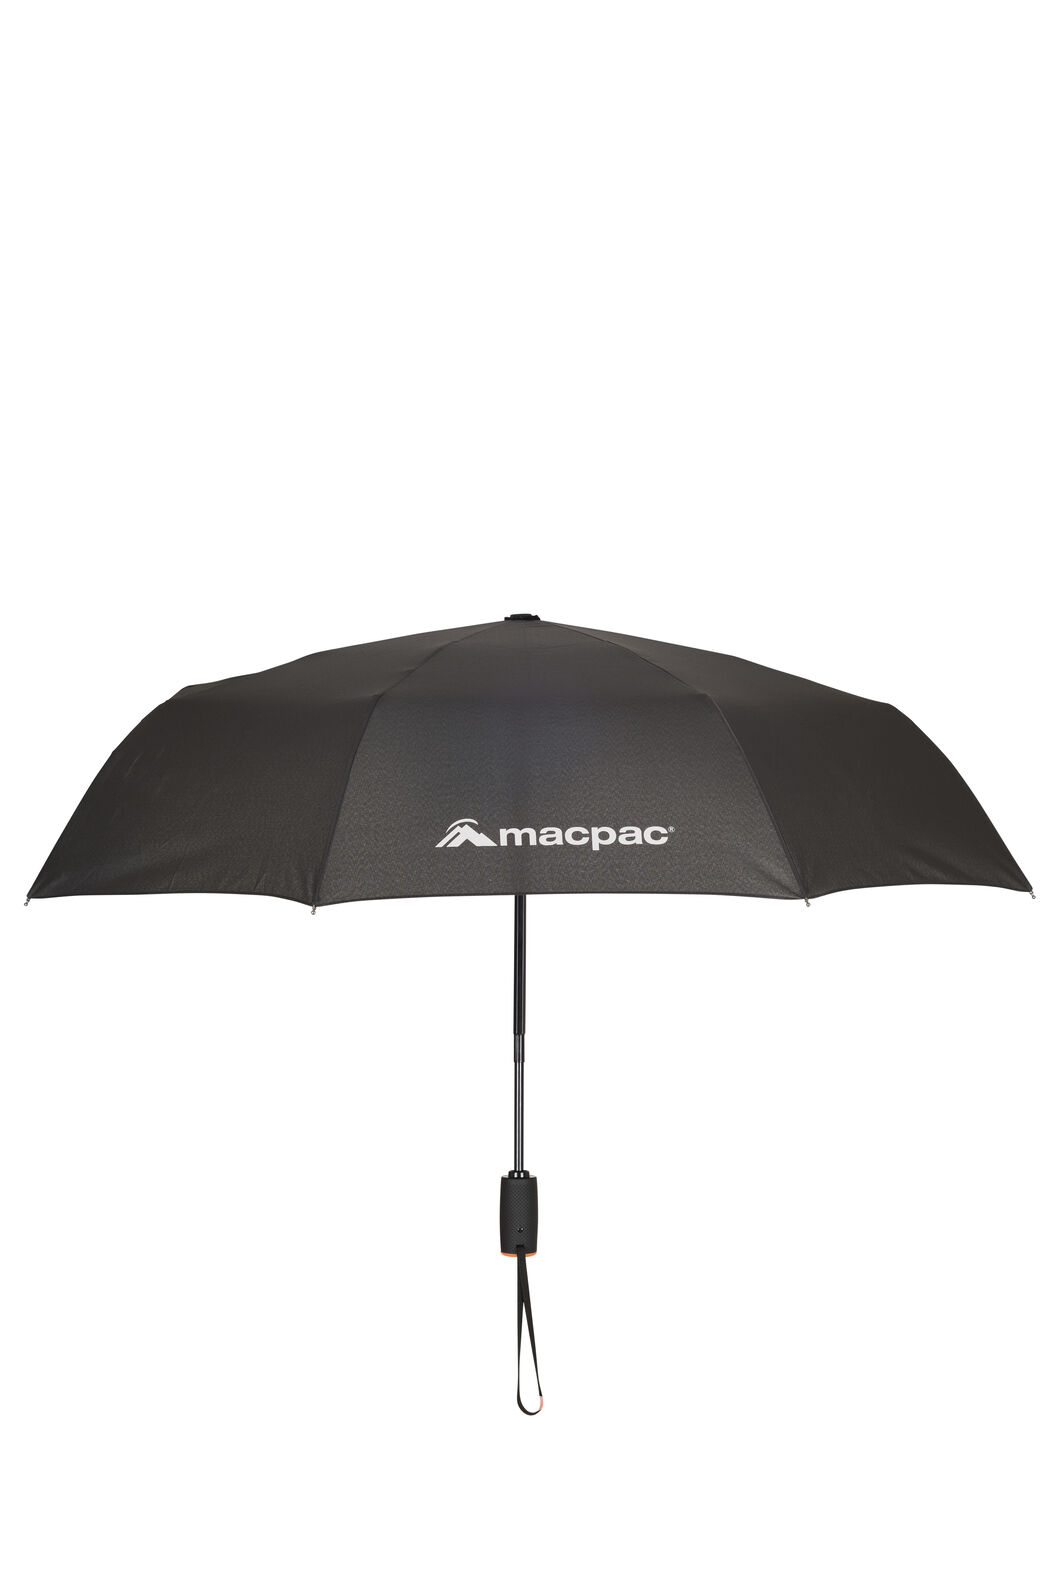 Macpac Travel Umbrella, Black, hi-res